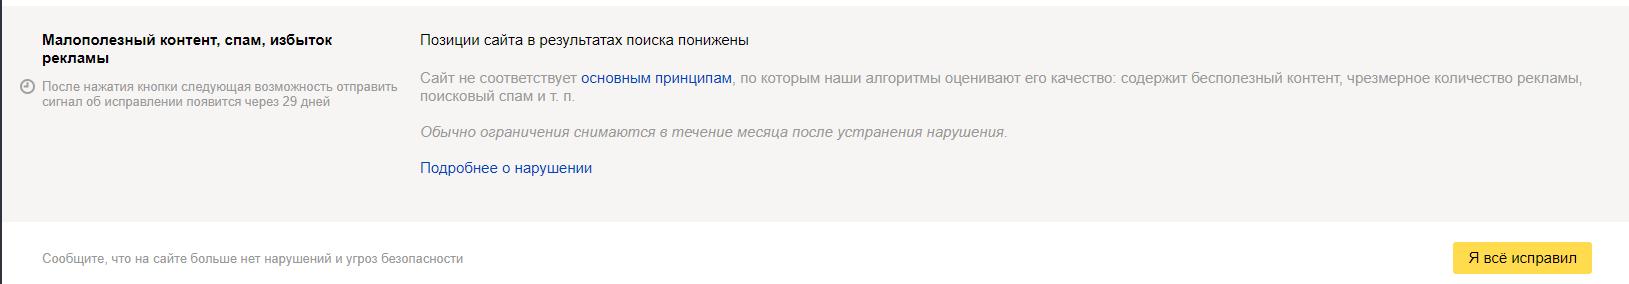 Метка сайта в вебмастерсе